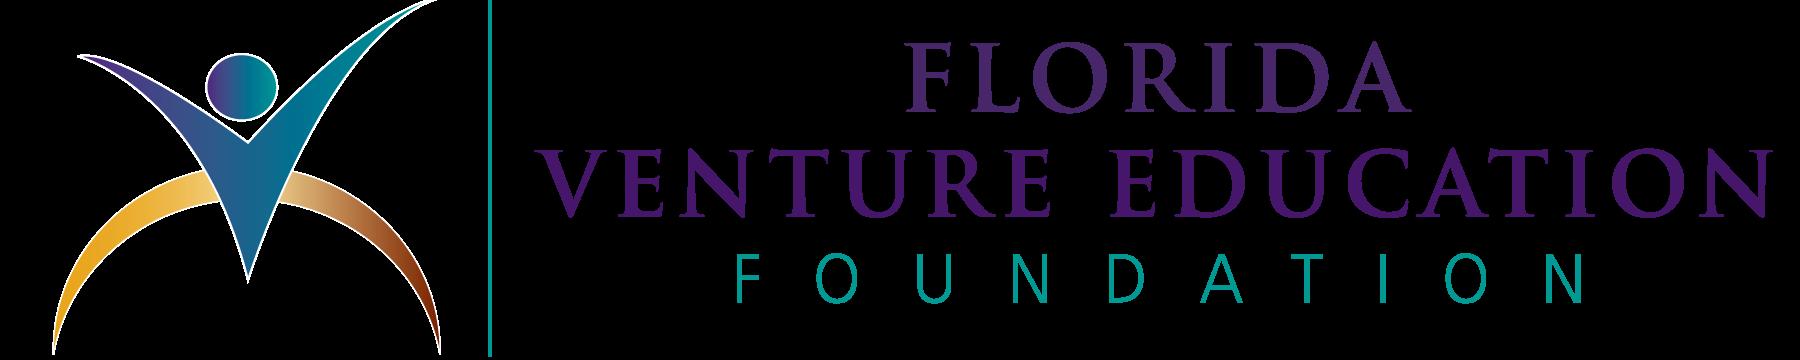 Florida Venture Education Foundation